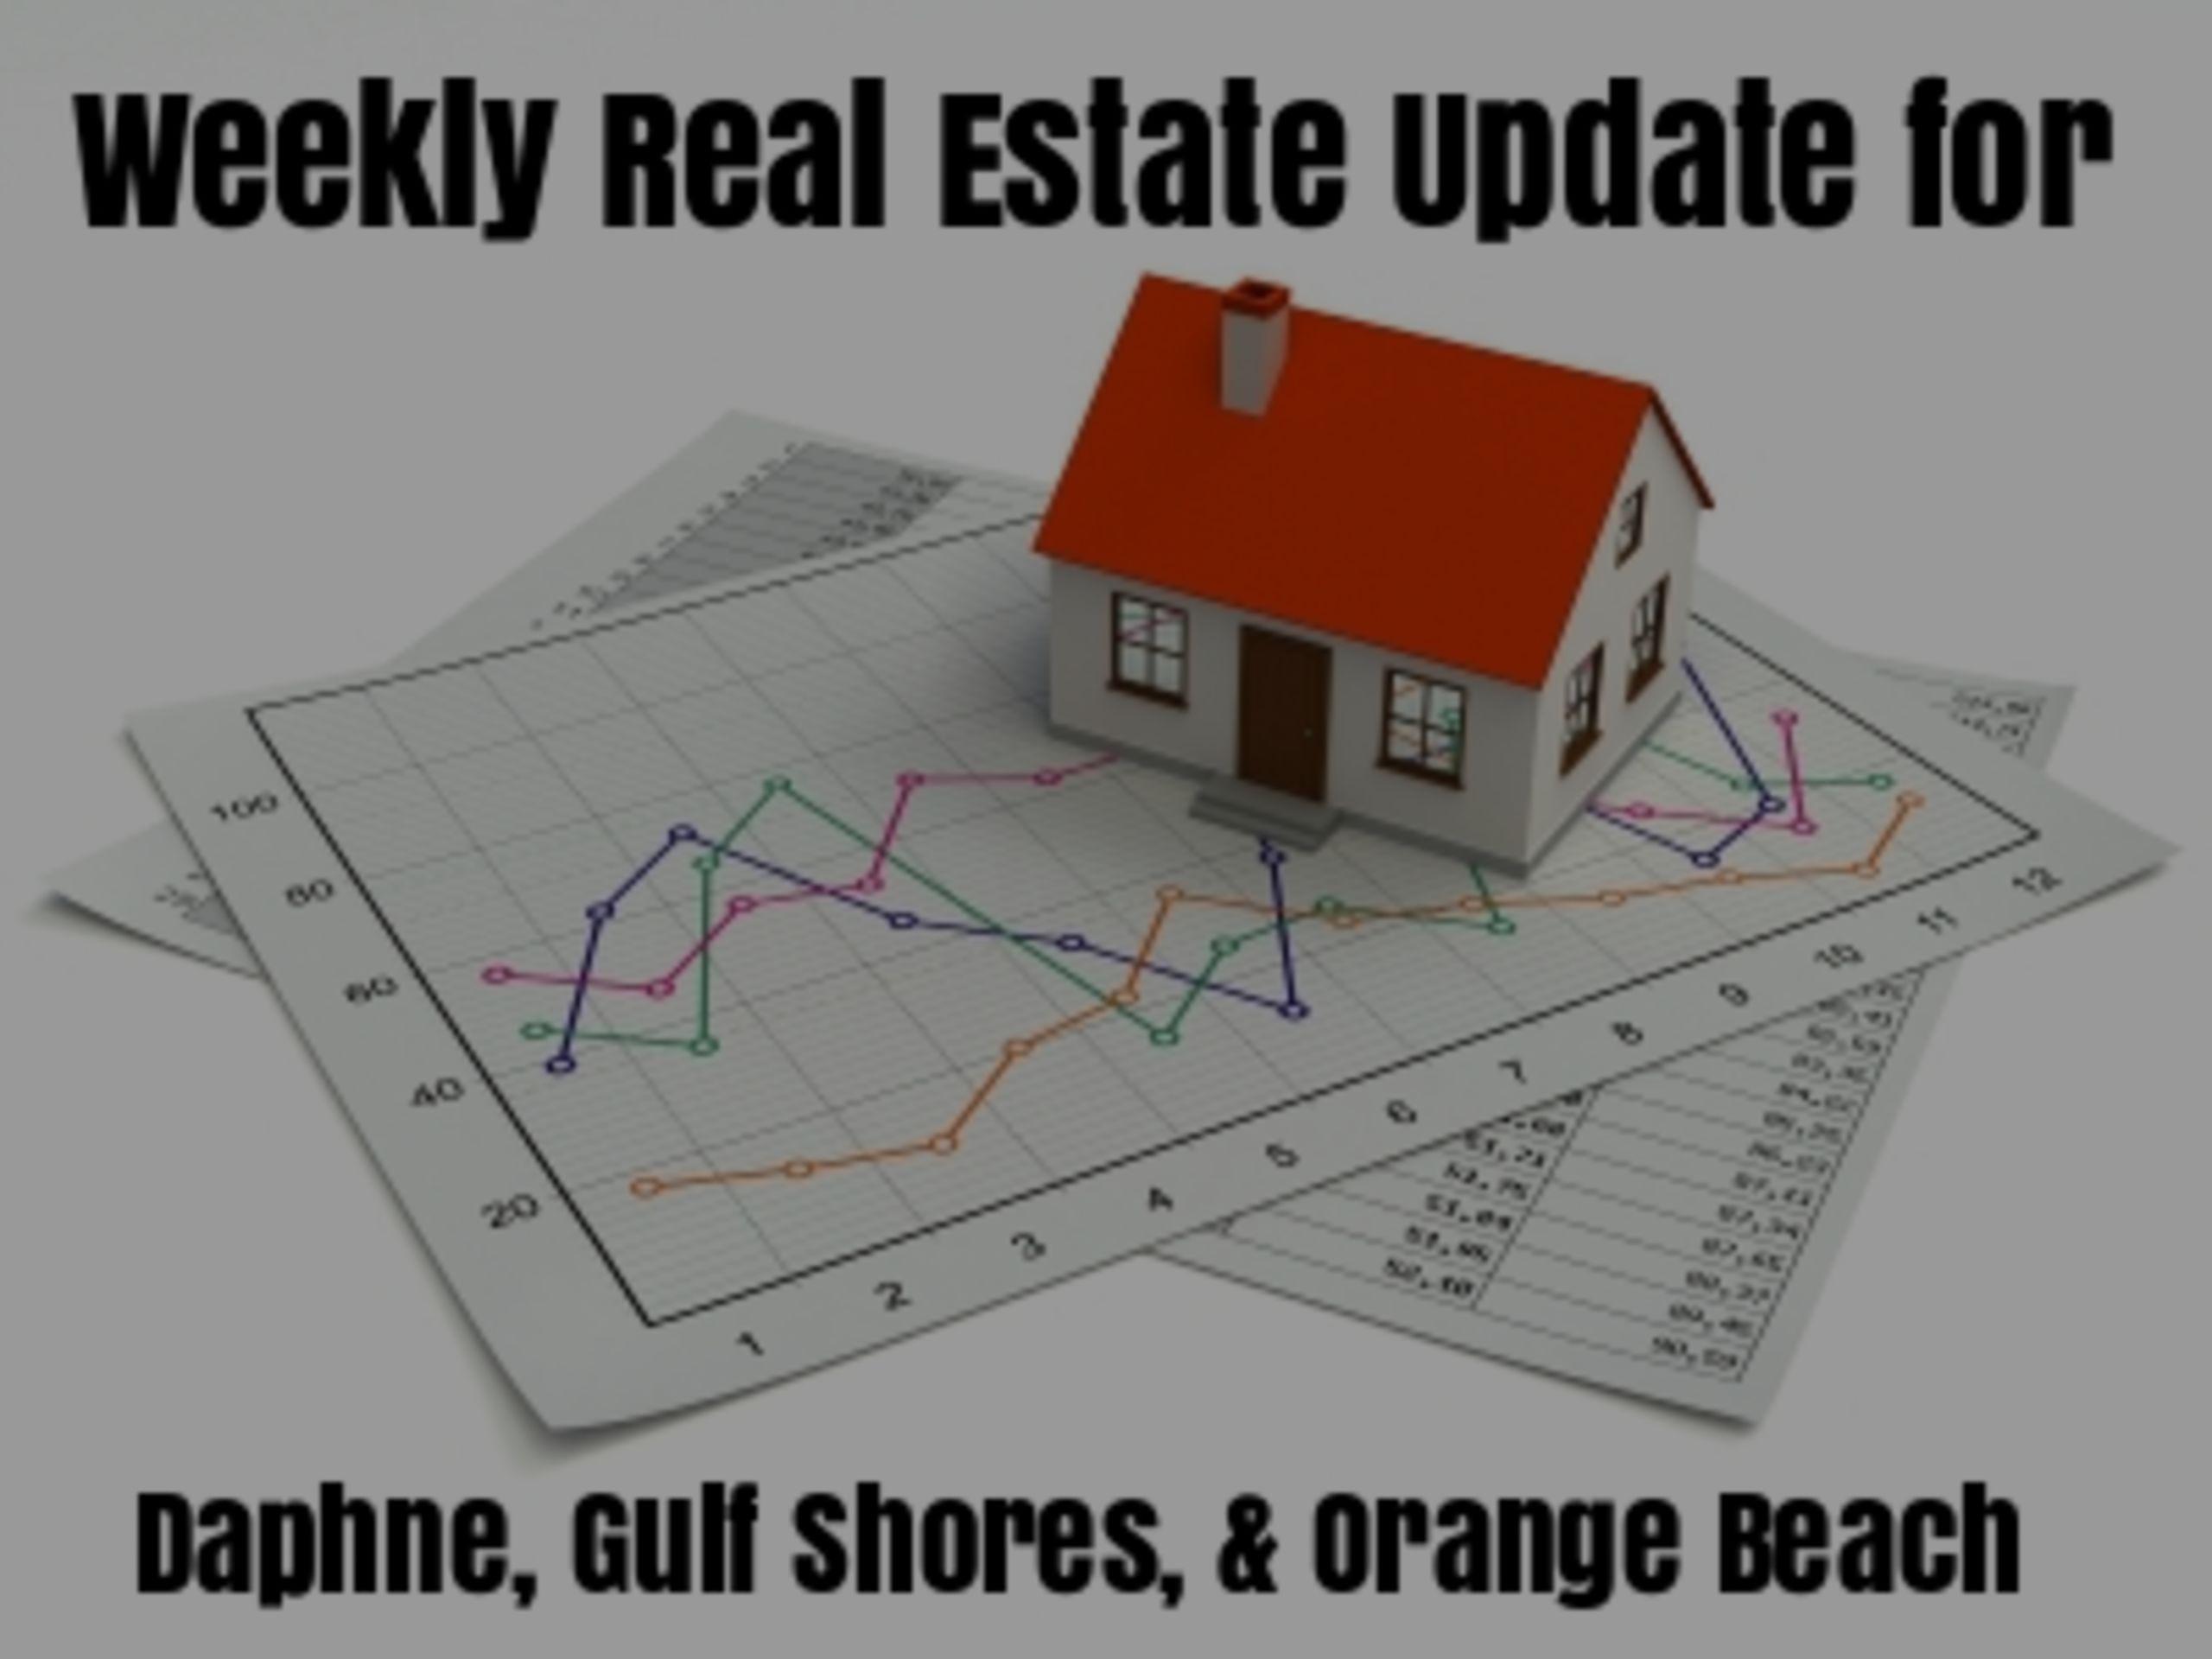 Weekly Real Estate Update – Daphne, Gulf Shores, and Orange Beach – 6/5/17